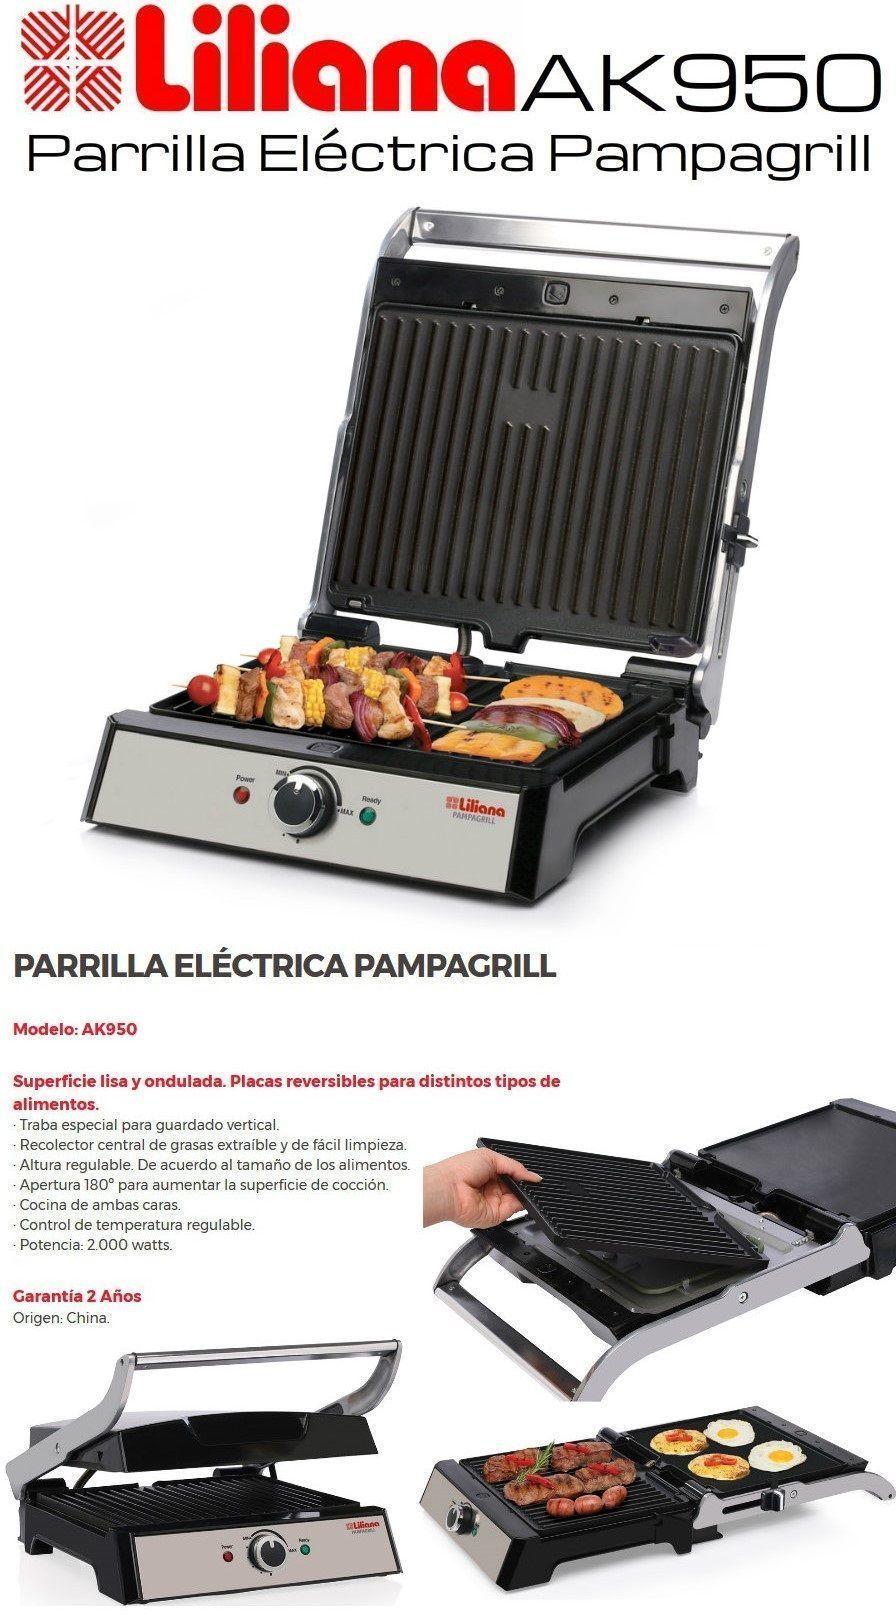 Parrilla electrica grill liliana pampagrill 2000w for Parrilla electrica para casa